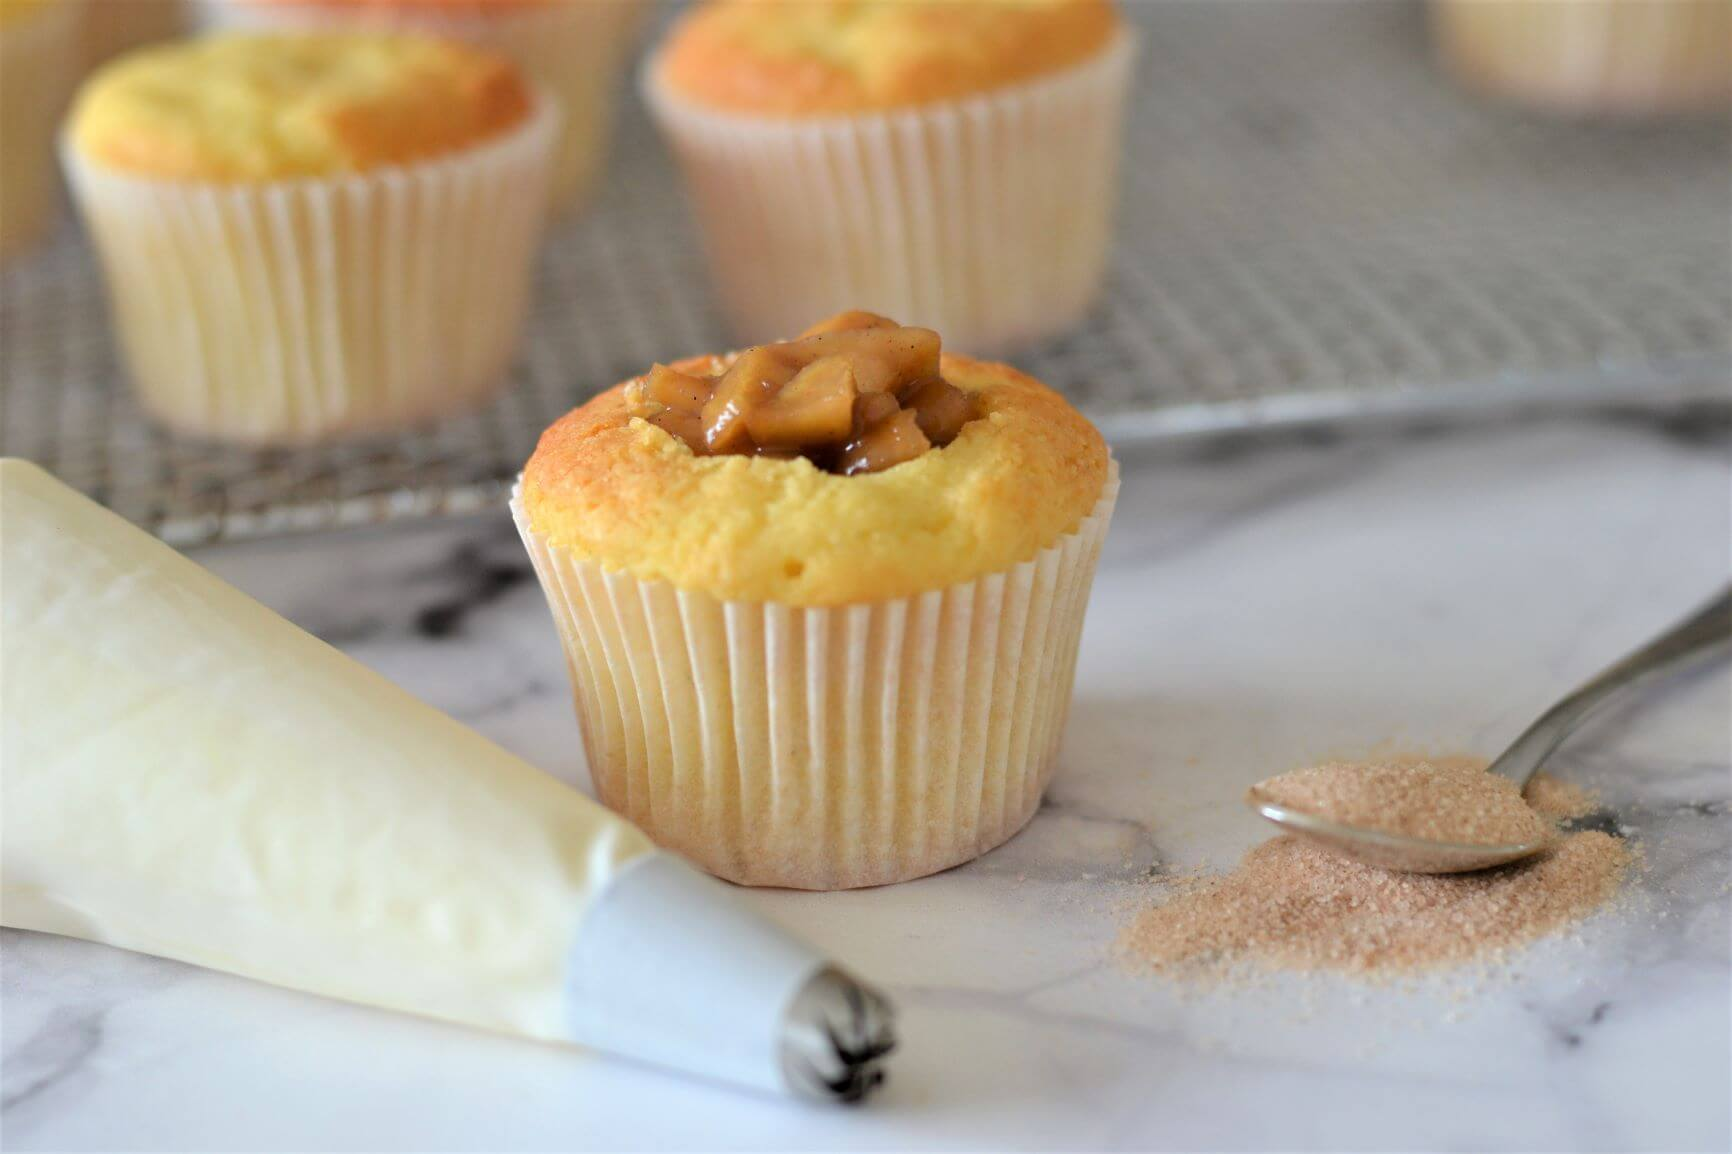 vanilla-cupcake-with-caramel-apple-filling